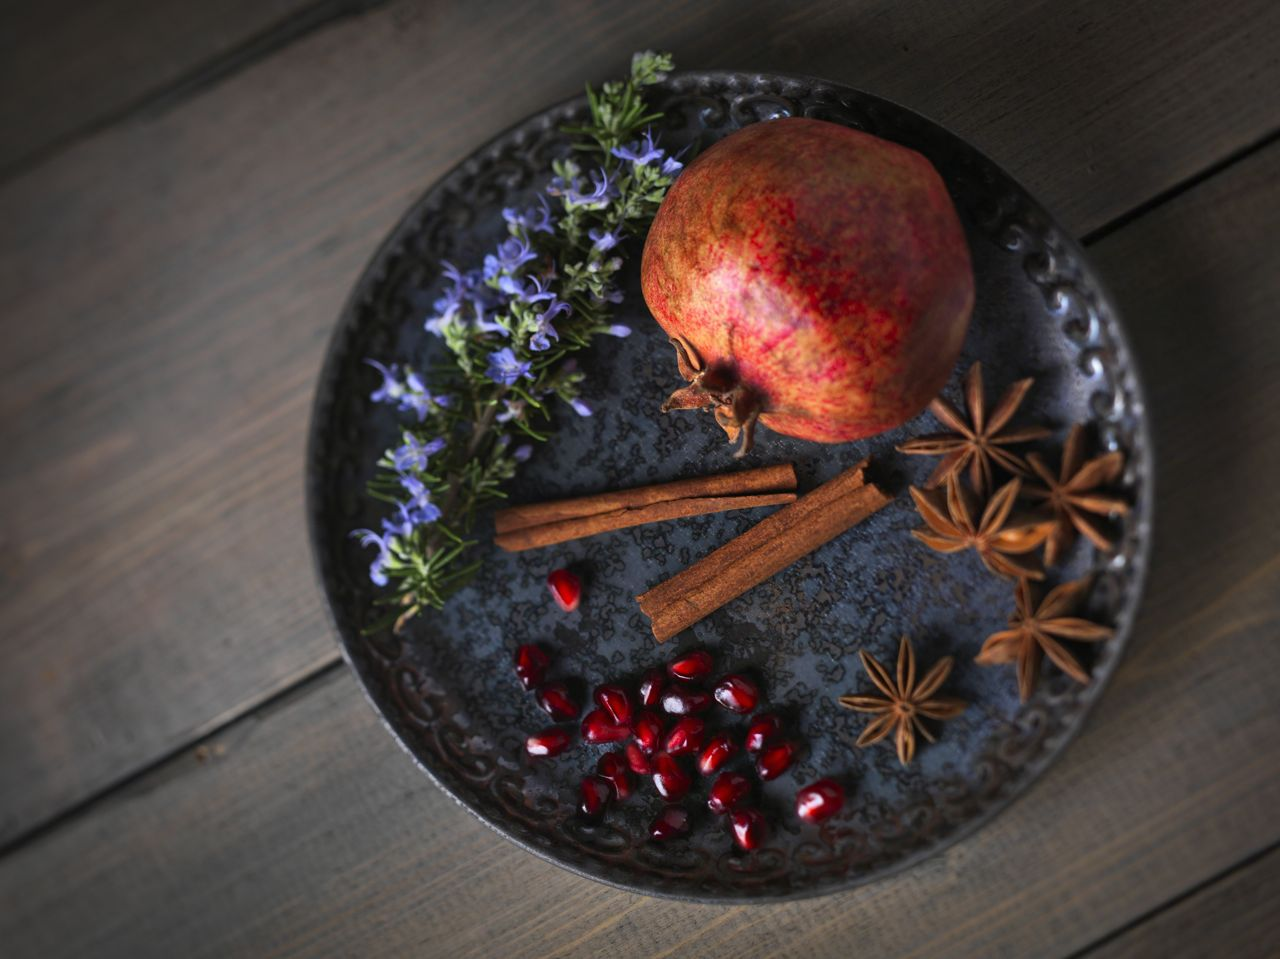 Cinnamon, rosemary, star anise